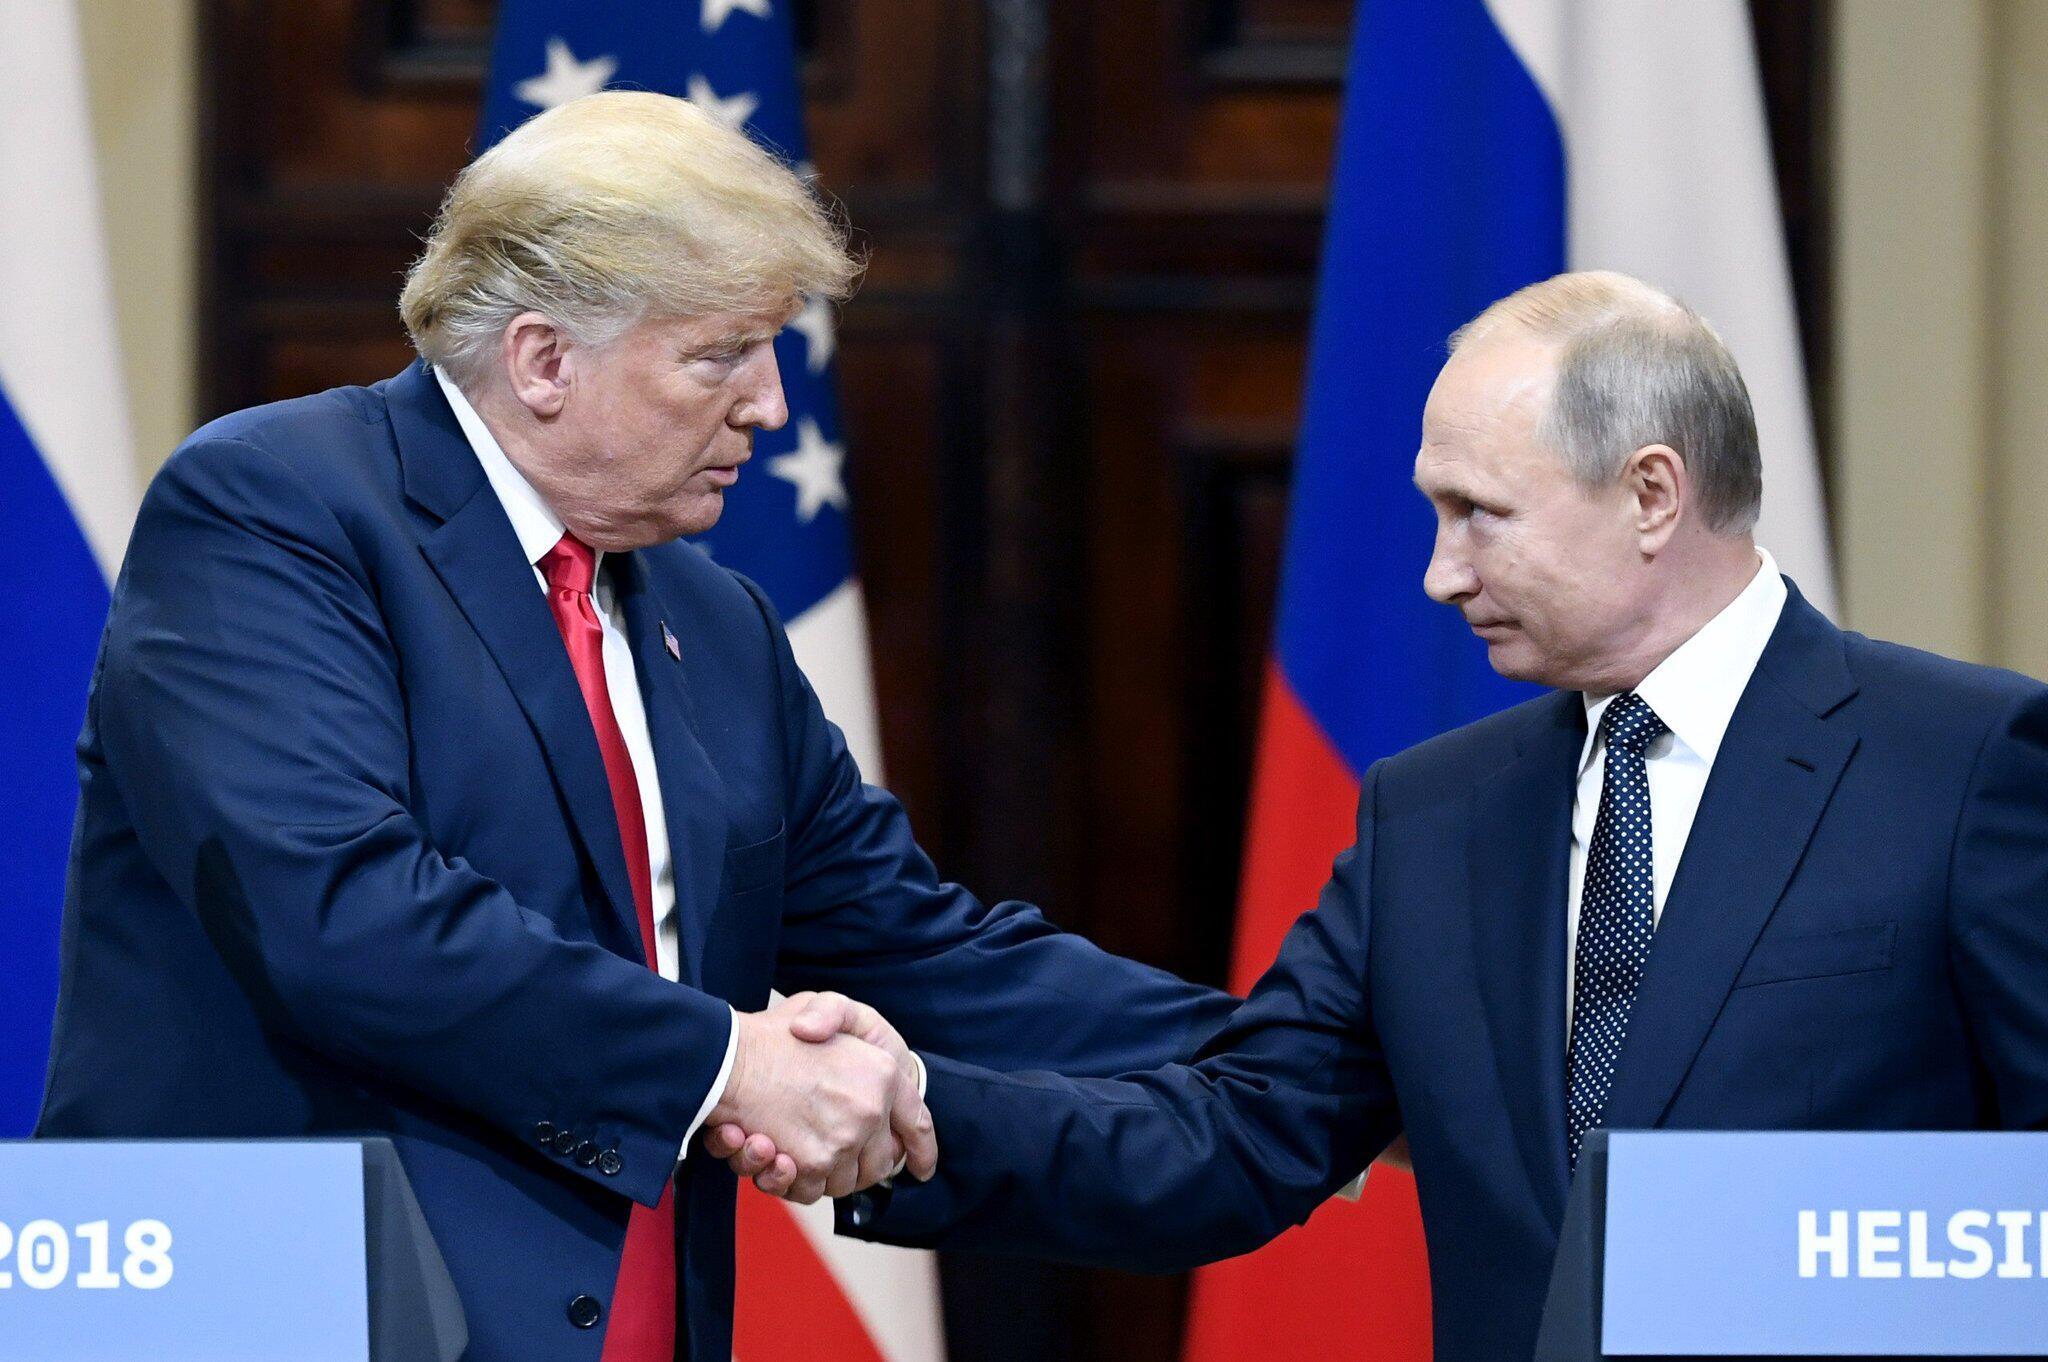 Bild zu Donald Trump, Wladimir Putin, Helsinki, Gipfel, USA, Russland